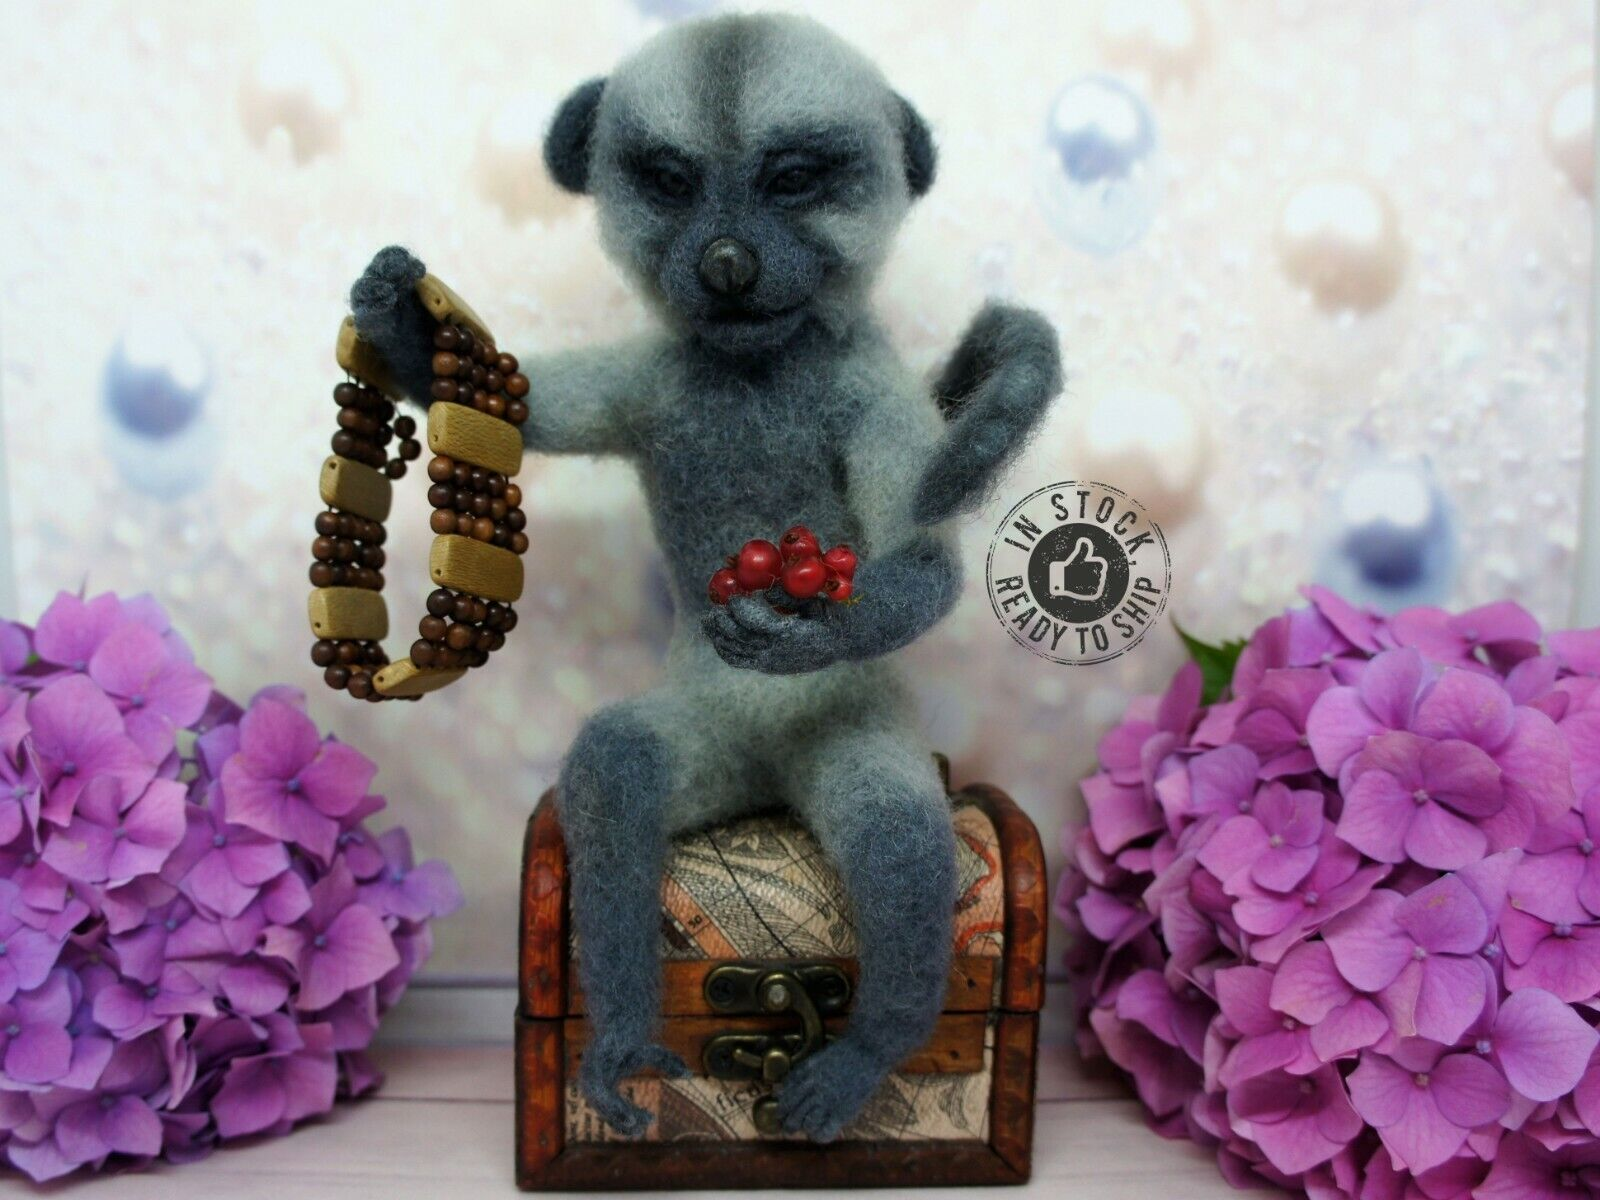 Wool toy toy Felted Marmasetka 7.87 in Handmade monkey Felt toy Merino wool Gift toy